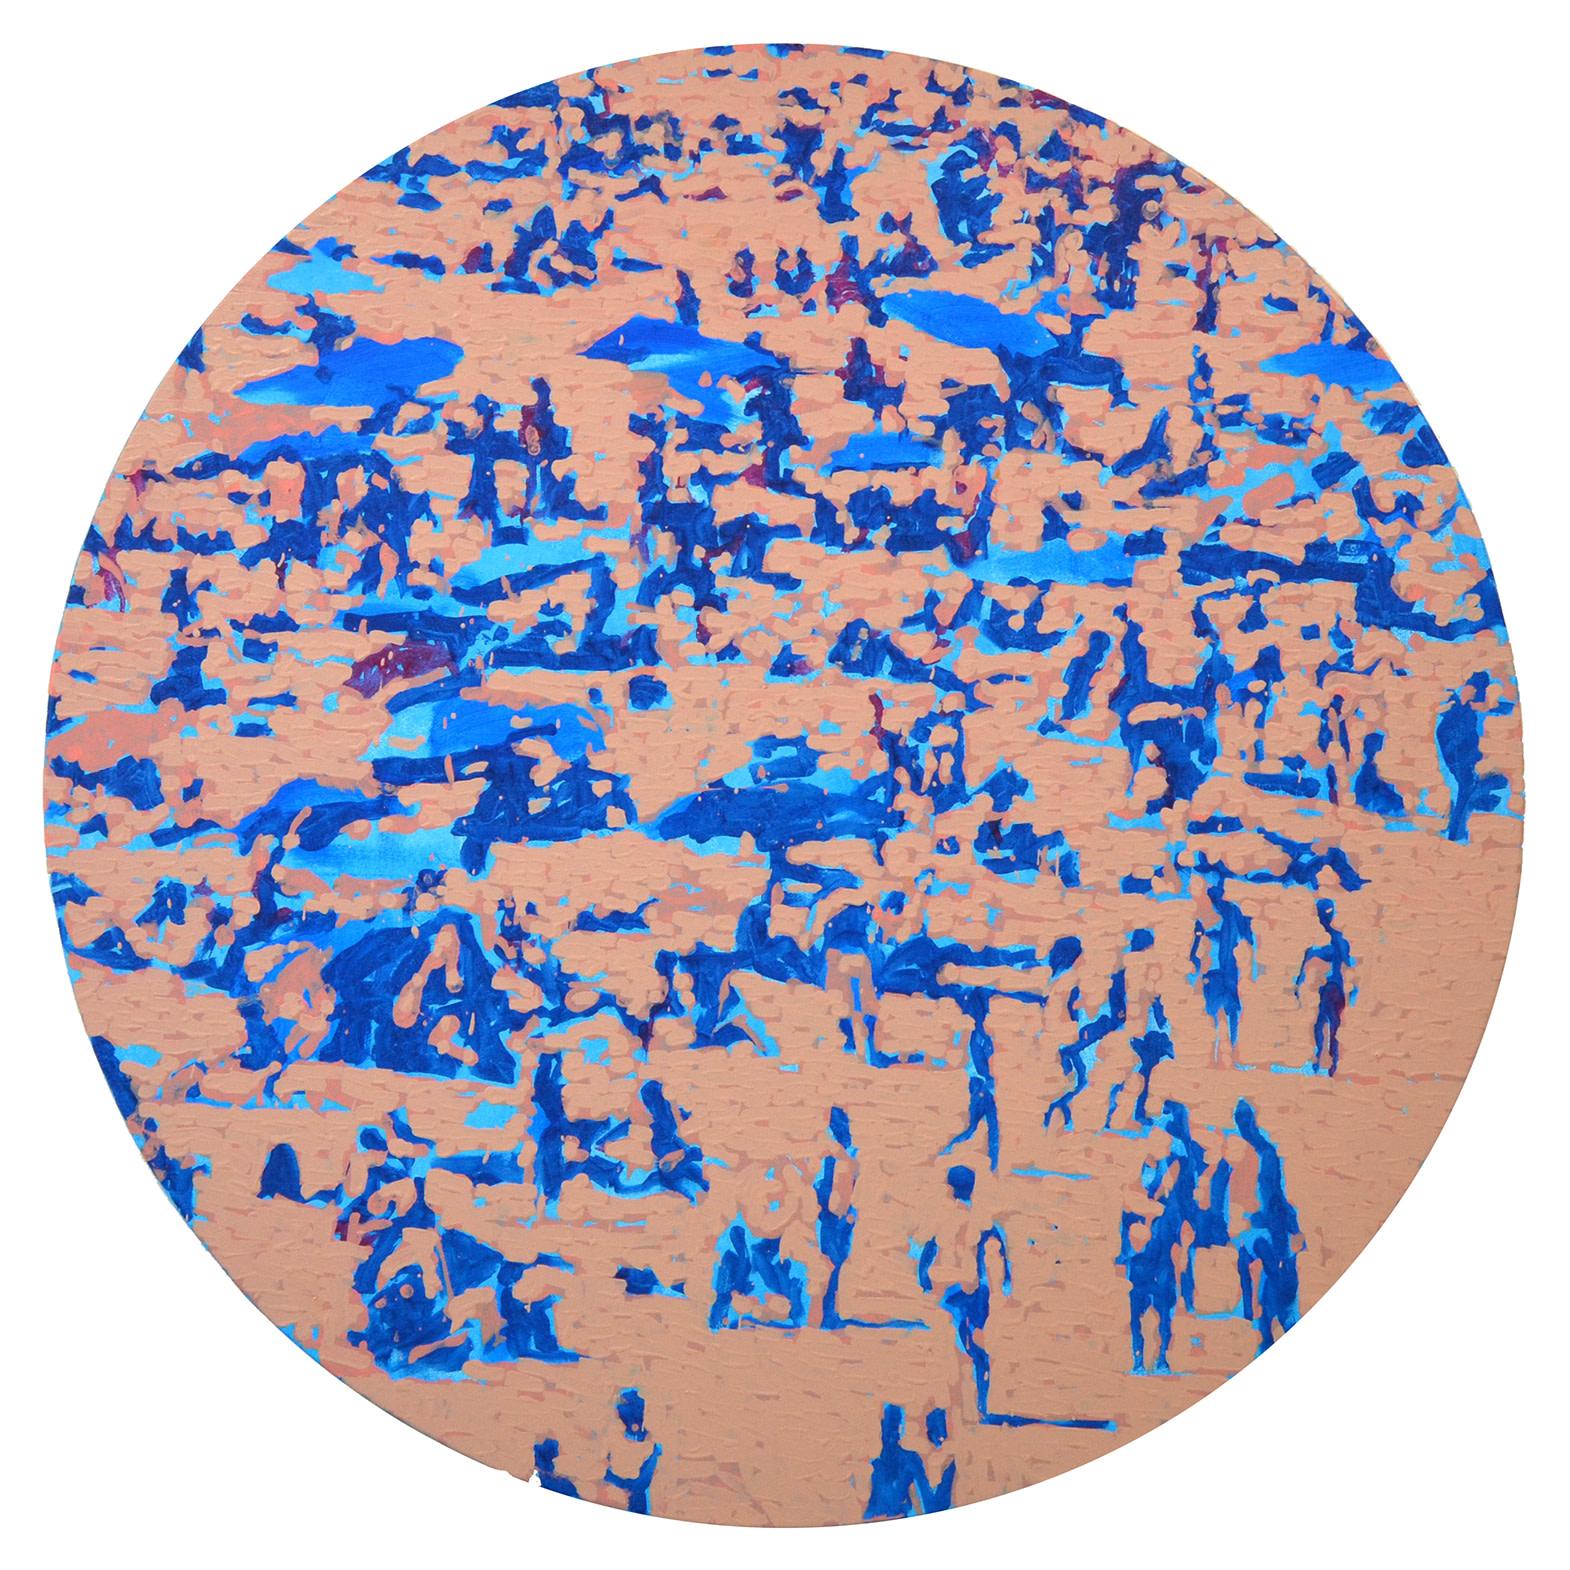 "<span class=""link fancybox-details-link""><a href=""/artists/42-nick-bodimeade/works/6385-nick-bodimeade-beach-tondo-2-2019/"">View Detail Page</a></span><div class=""artist""><strong>Nick Bodimeade</strong></div> (1957-) <div class=""title""><em>Beach Tondo 2</em>, 2019</div> <div class=""signed_and_dated"">signed, titled and dated on reverse</div> <div class=""medium"">oil on canvas</div> <div class=""dimensions"">120 cm dia.</div><div class=""price"">£2,800.00</div><div class=""copyright_line"">OwnArt: £ 250 x 10 Months, 0% APR + £300 deposit</div>"